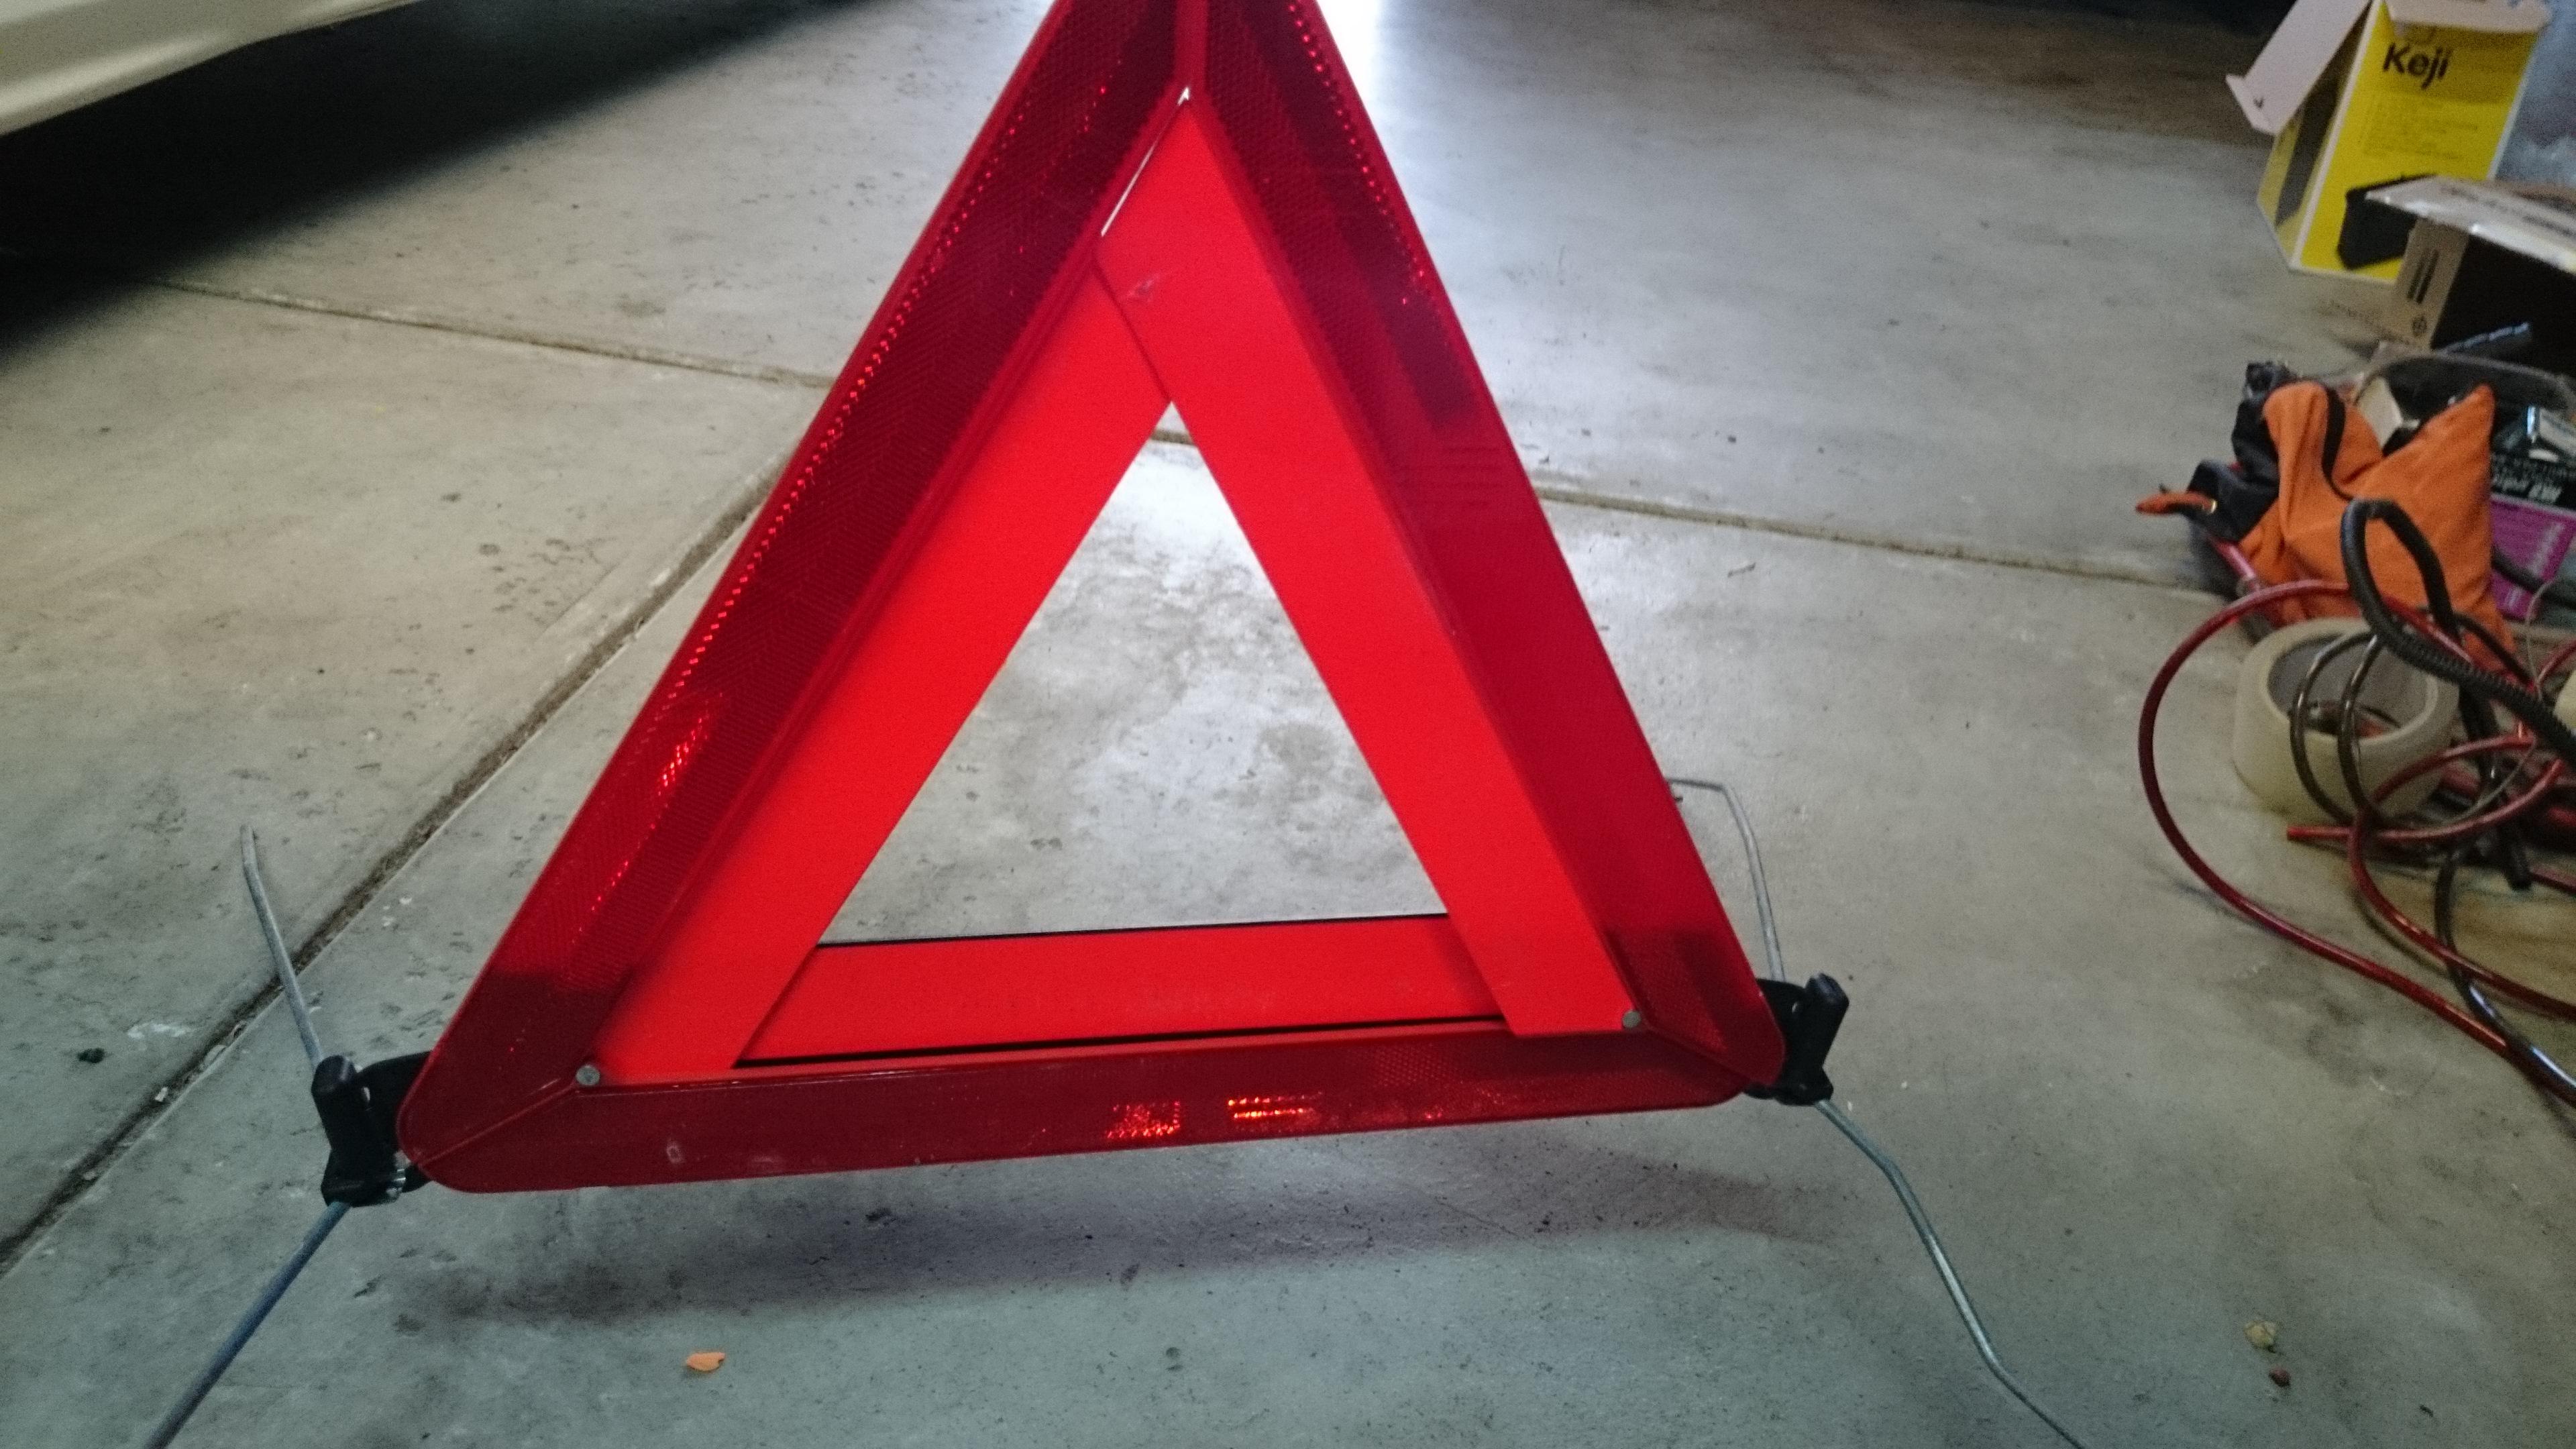 Lexus Is200 Is300 Is250 Is350 Oem Warning Triangle Car